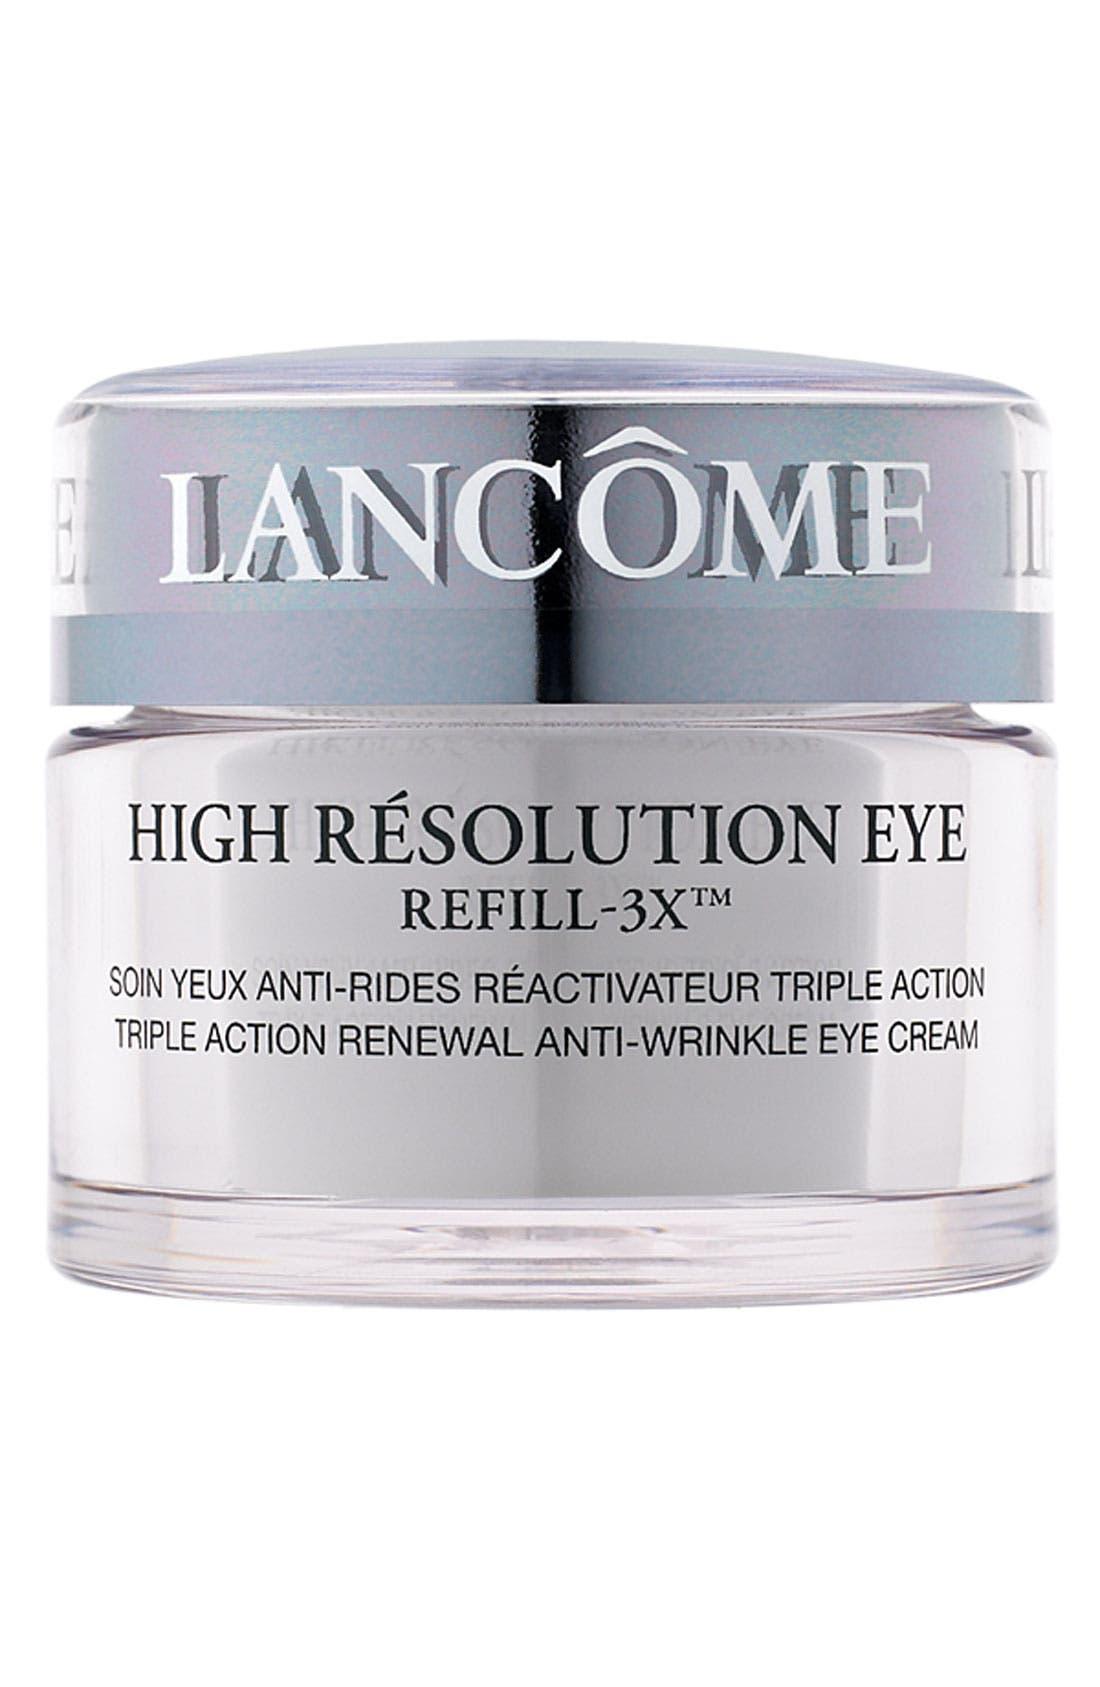 Lancome High Resolution Refill-3X Anti-Wrinkle Eye Cream